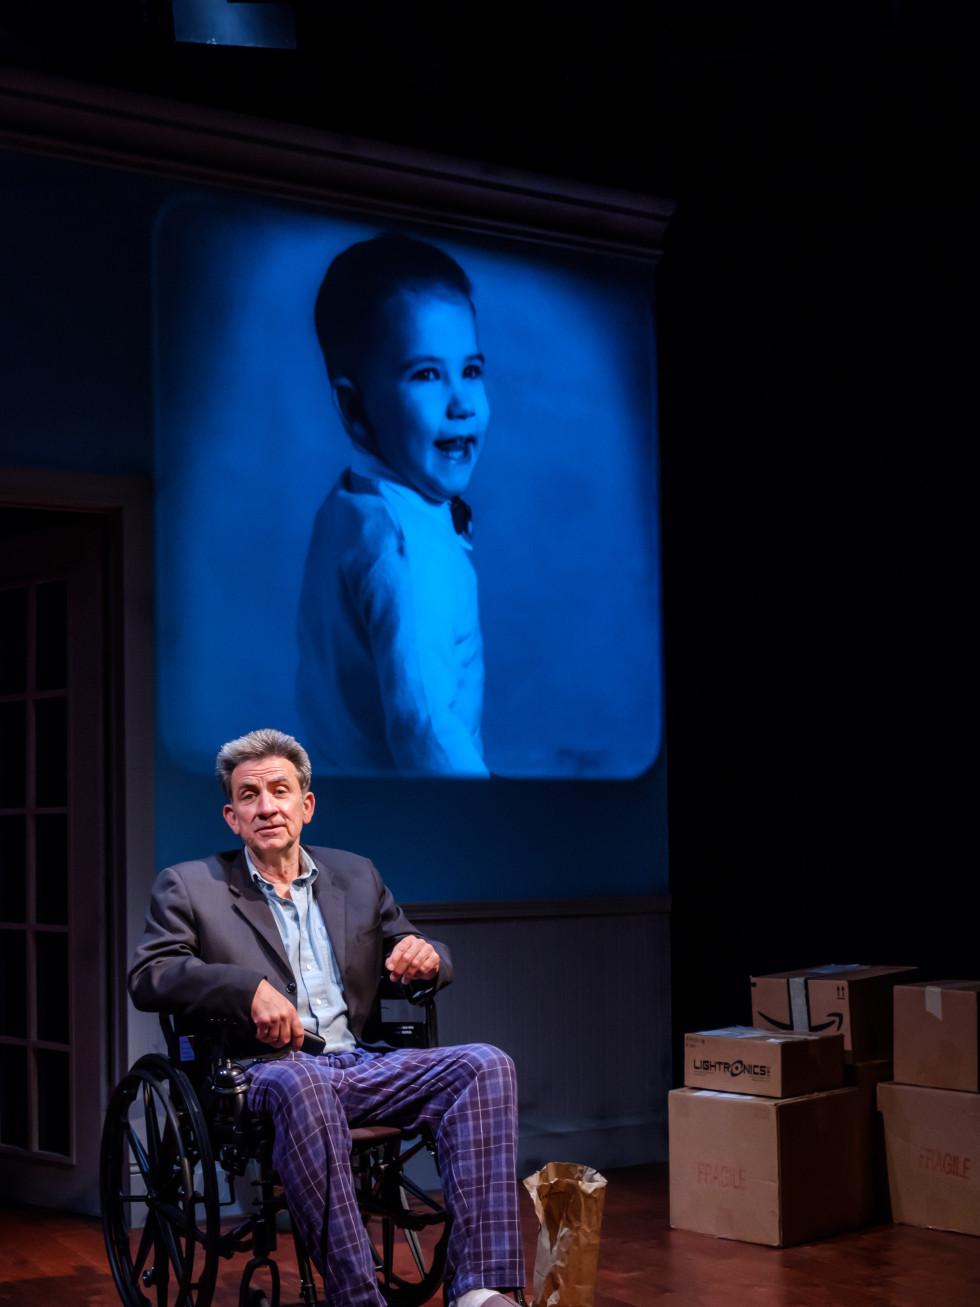 Catastrophic Theatre-Wakey, Wakey: Ken Webster